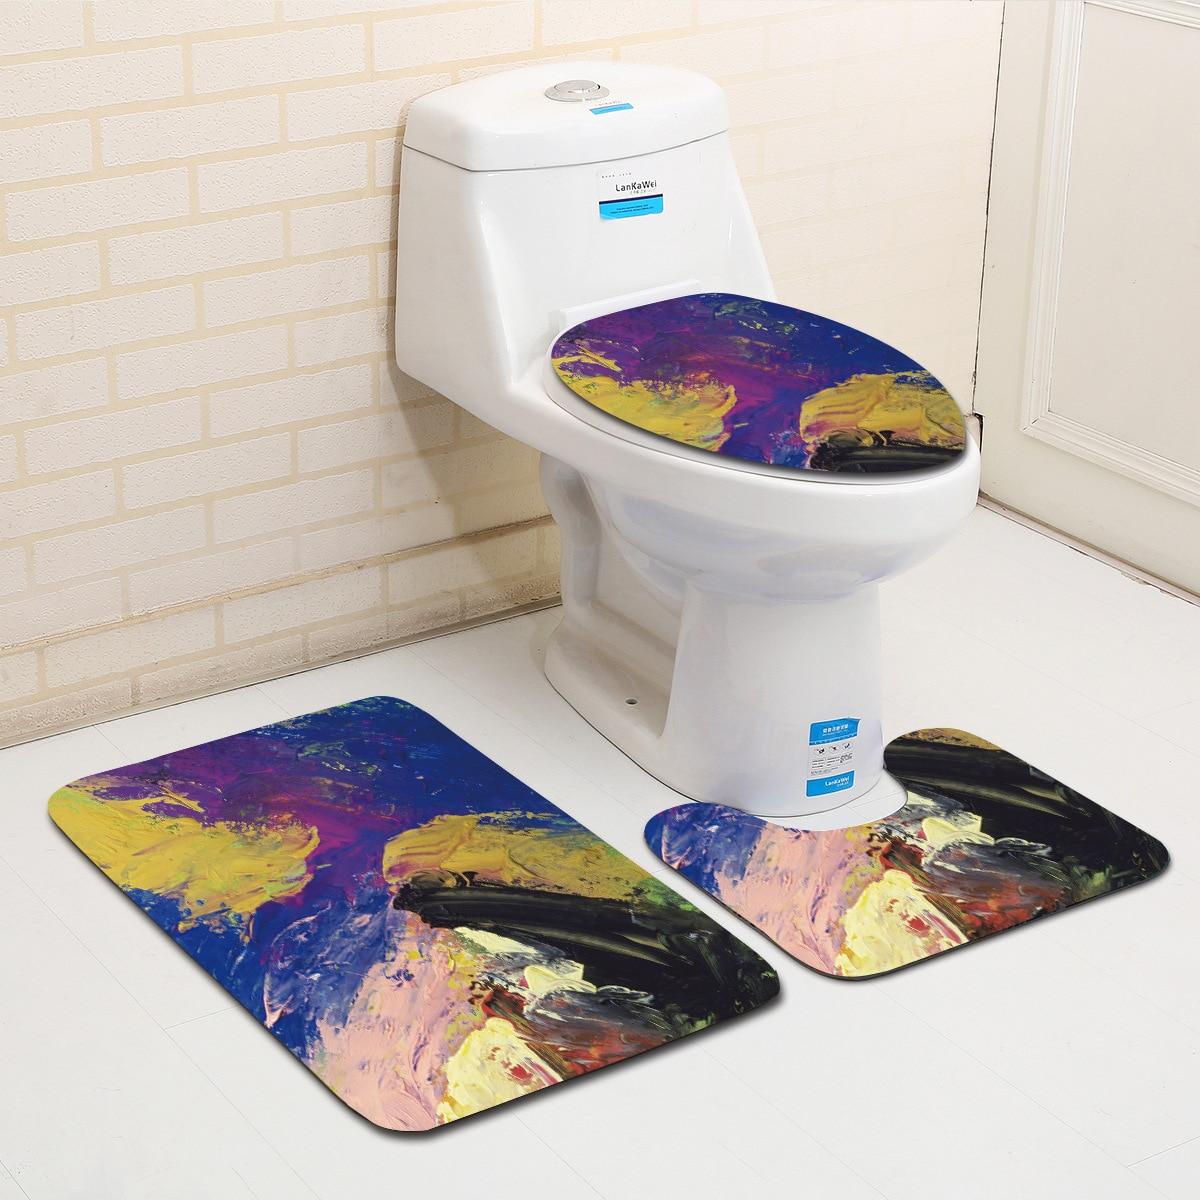 3Pcs Coloured Drawing or Pattern Toilet Decoration Bathroom Mat Soft Flannel Bath Rug Non-slip Foot Mat Beside Restroom Doormat